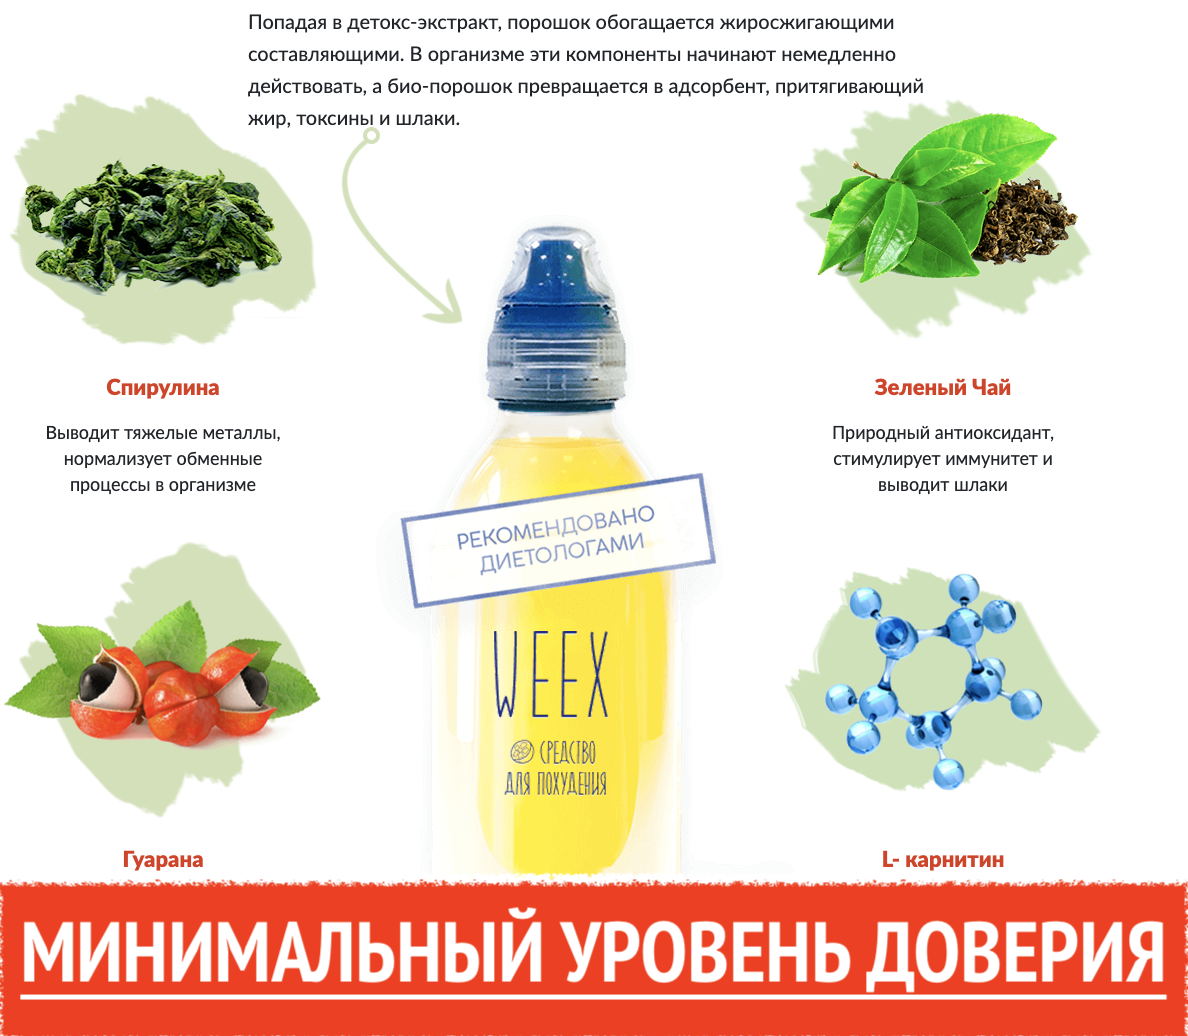 http://low.weex-new.ru